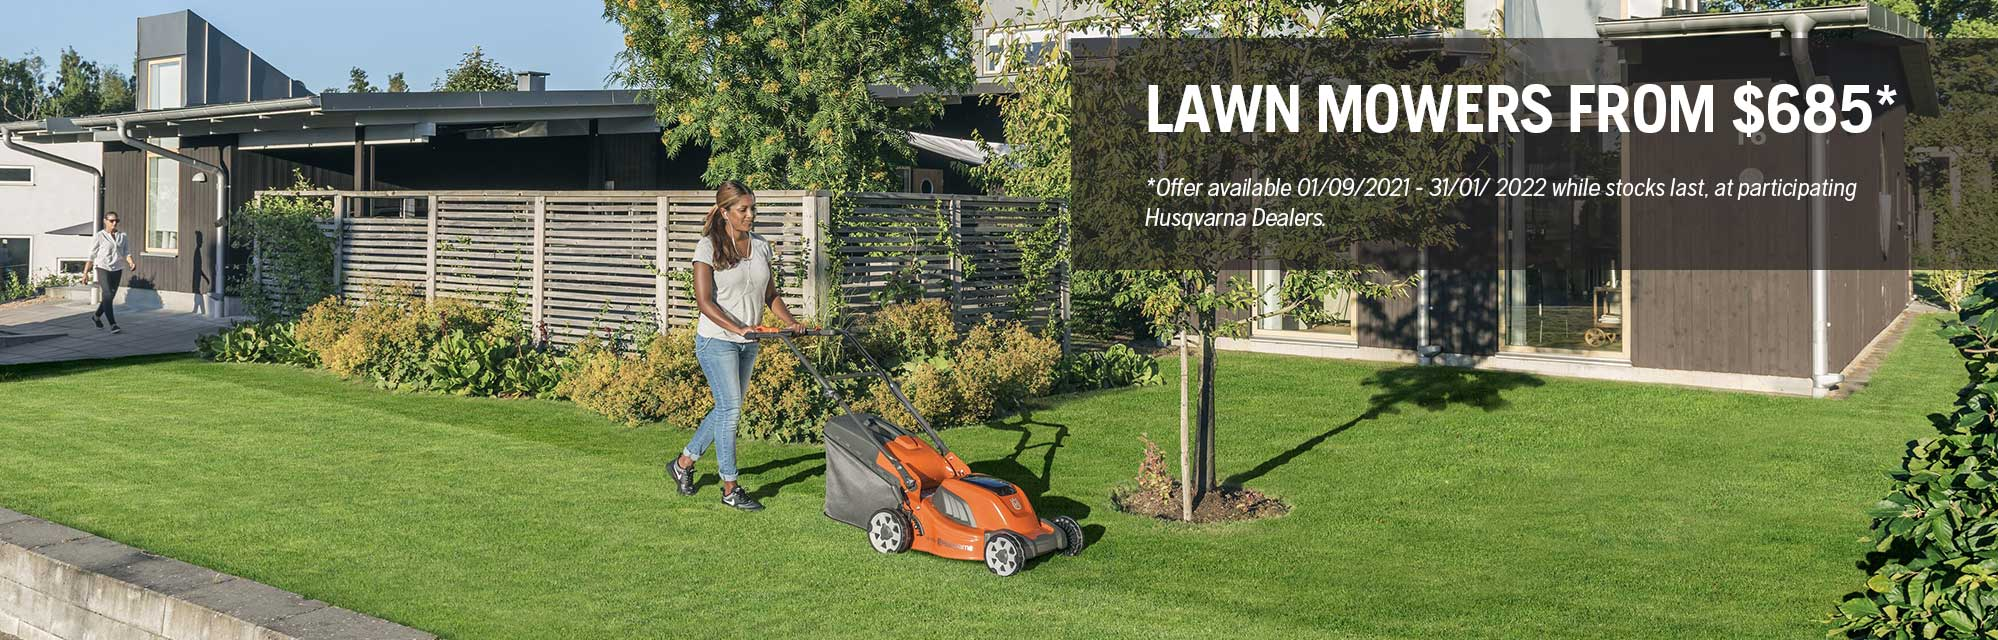 Lawn Mower - Spring